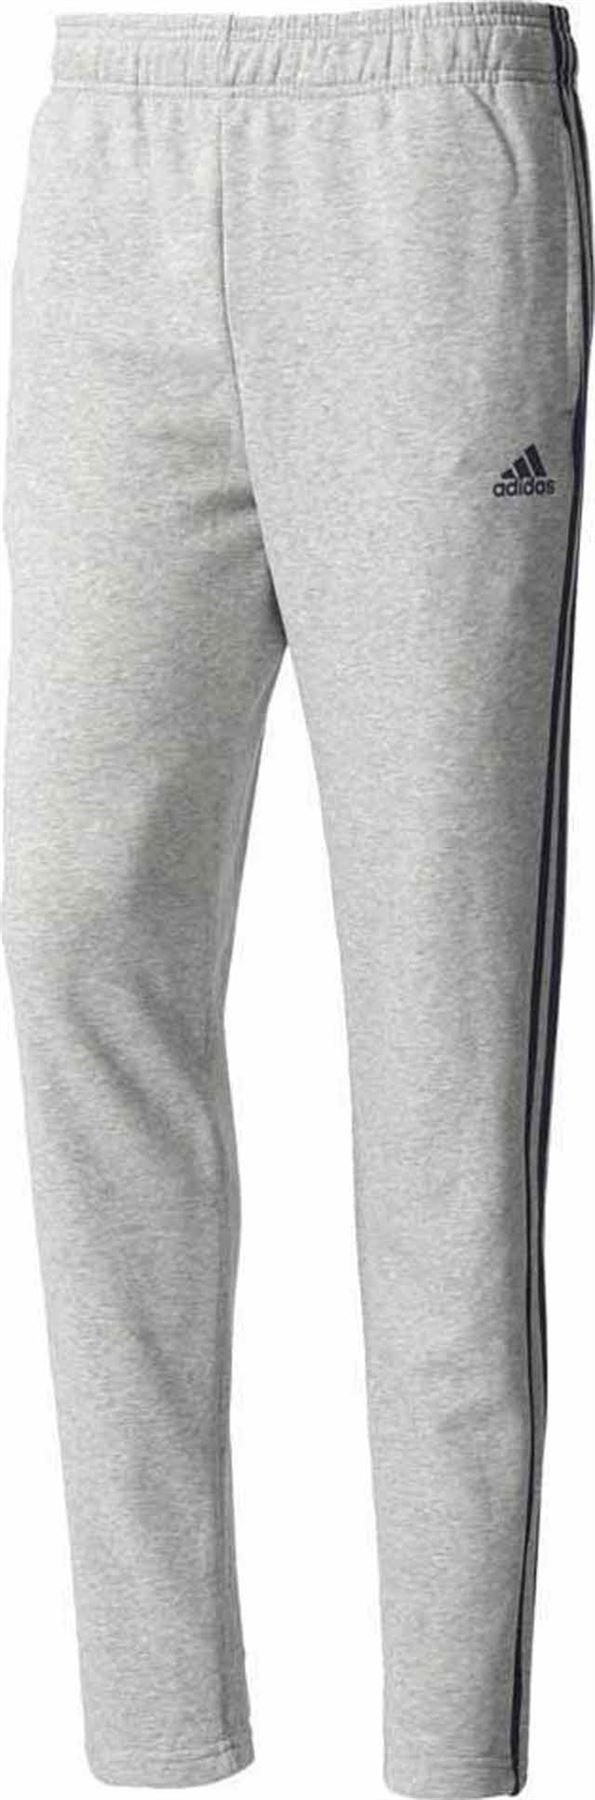 Adidas Essentials Para Hombre Pantalones De Pista Jog Oferta Mas Tamanos 5 Estilos Rrp 35 45 Oferta Ebay